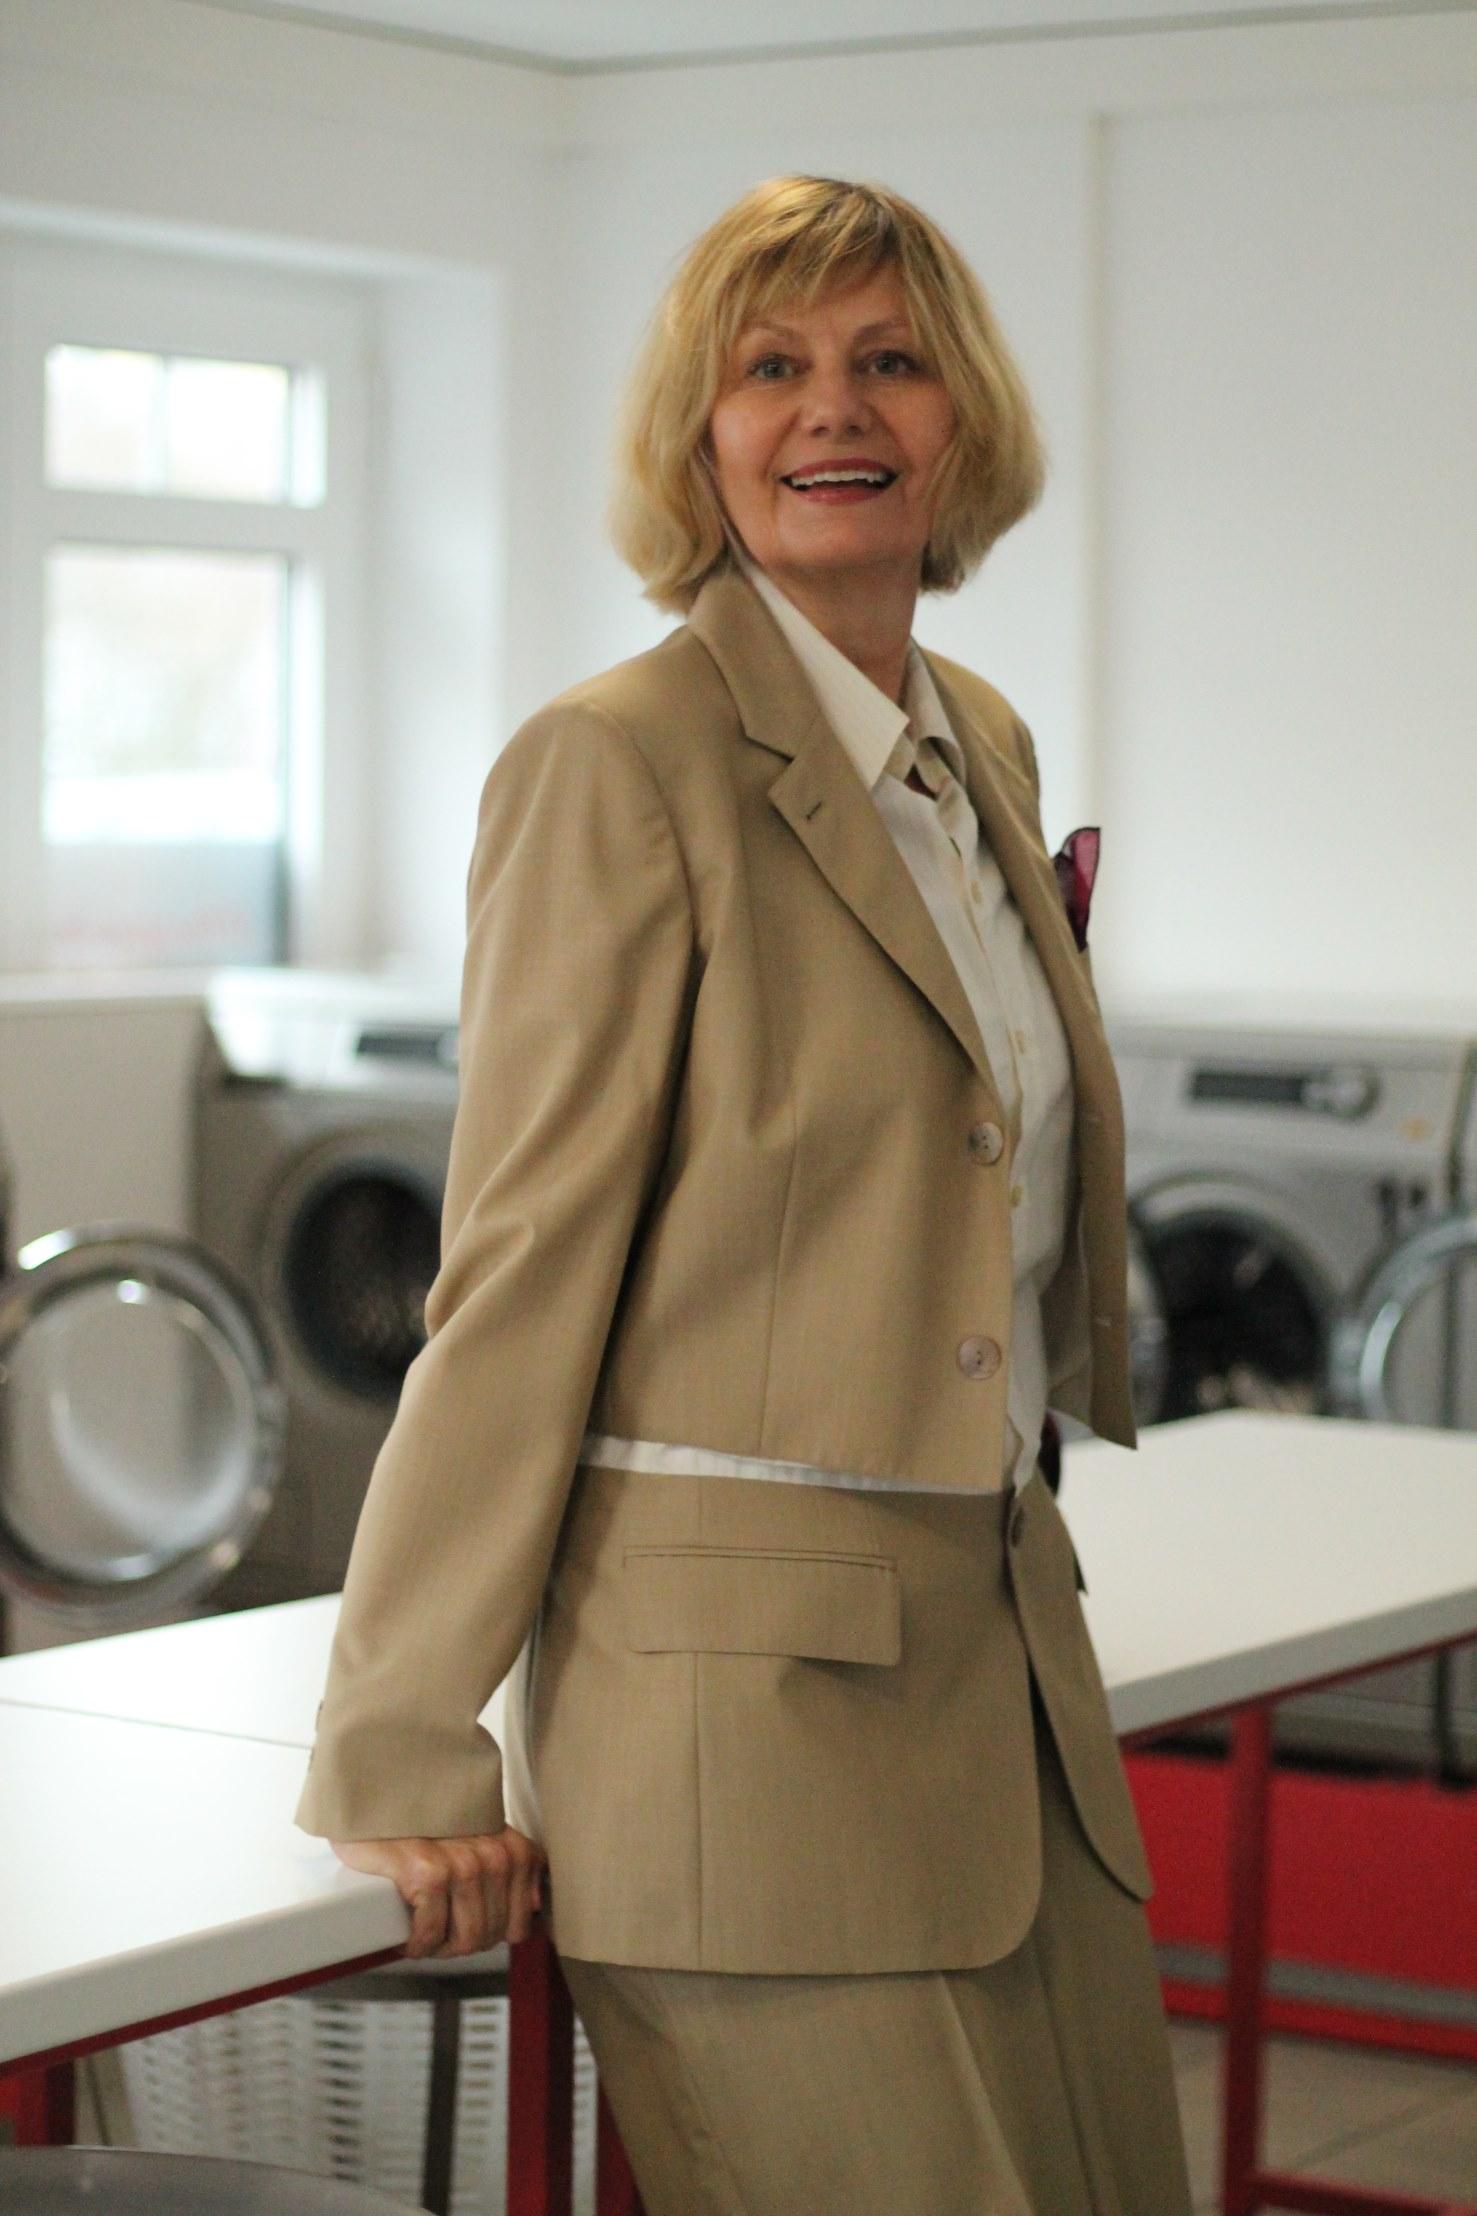 Westerland Sylt Waschsalon Jean-Paul Gaultier Anzug Louis Vuitton Tasche